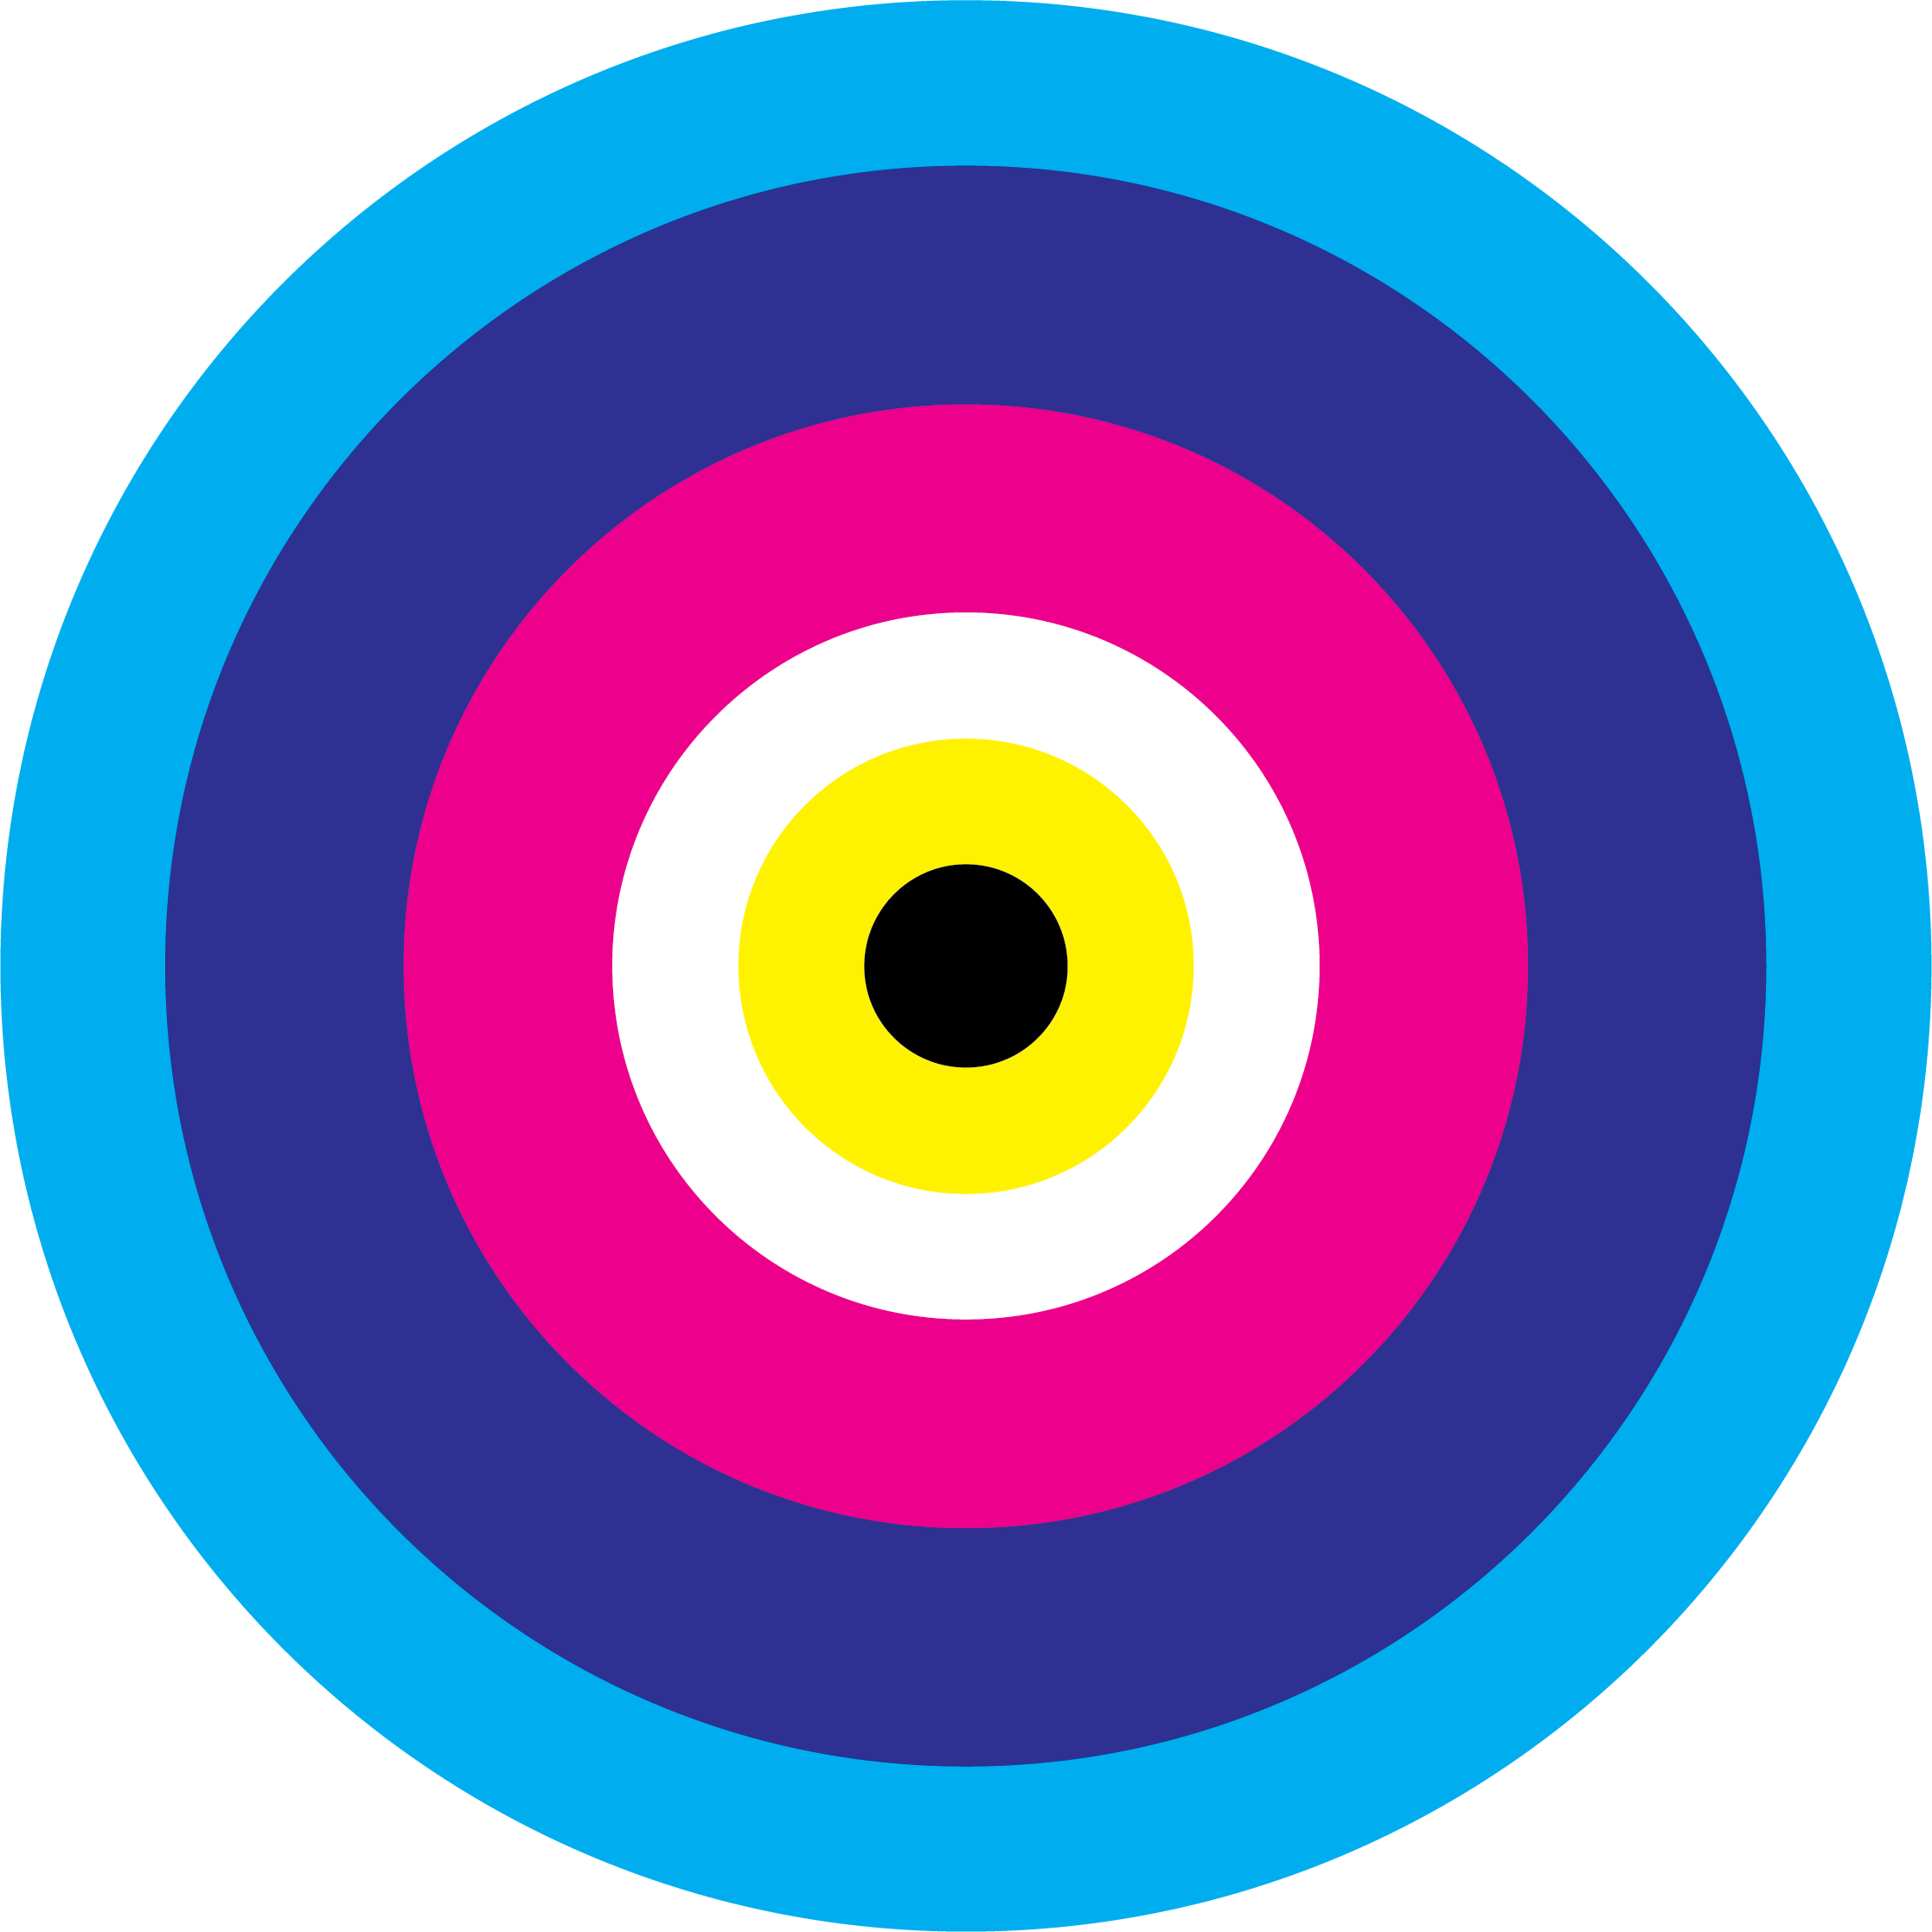 Kaleidoscope on LogoLounge